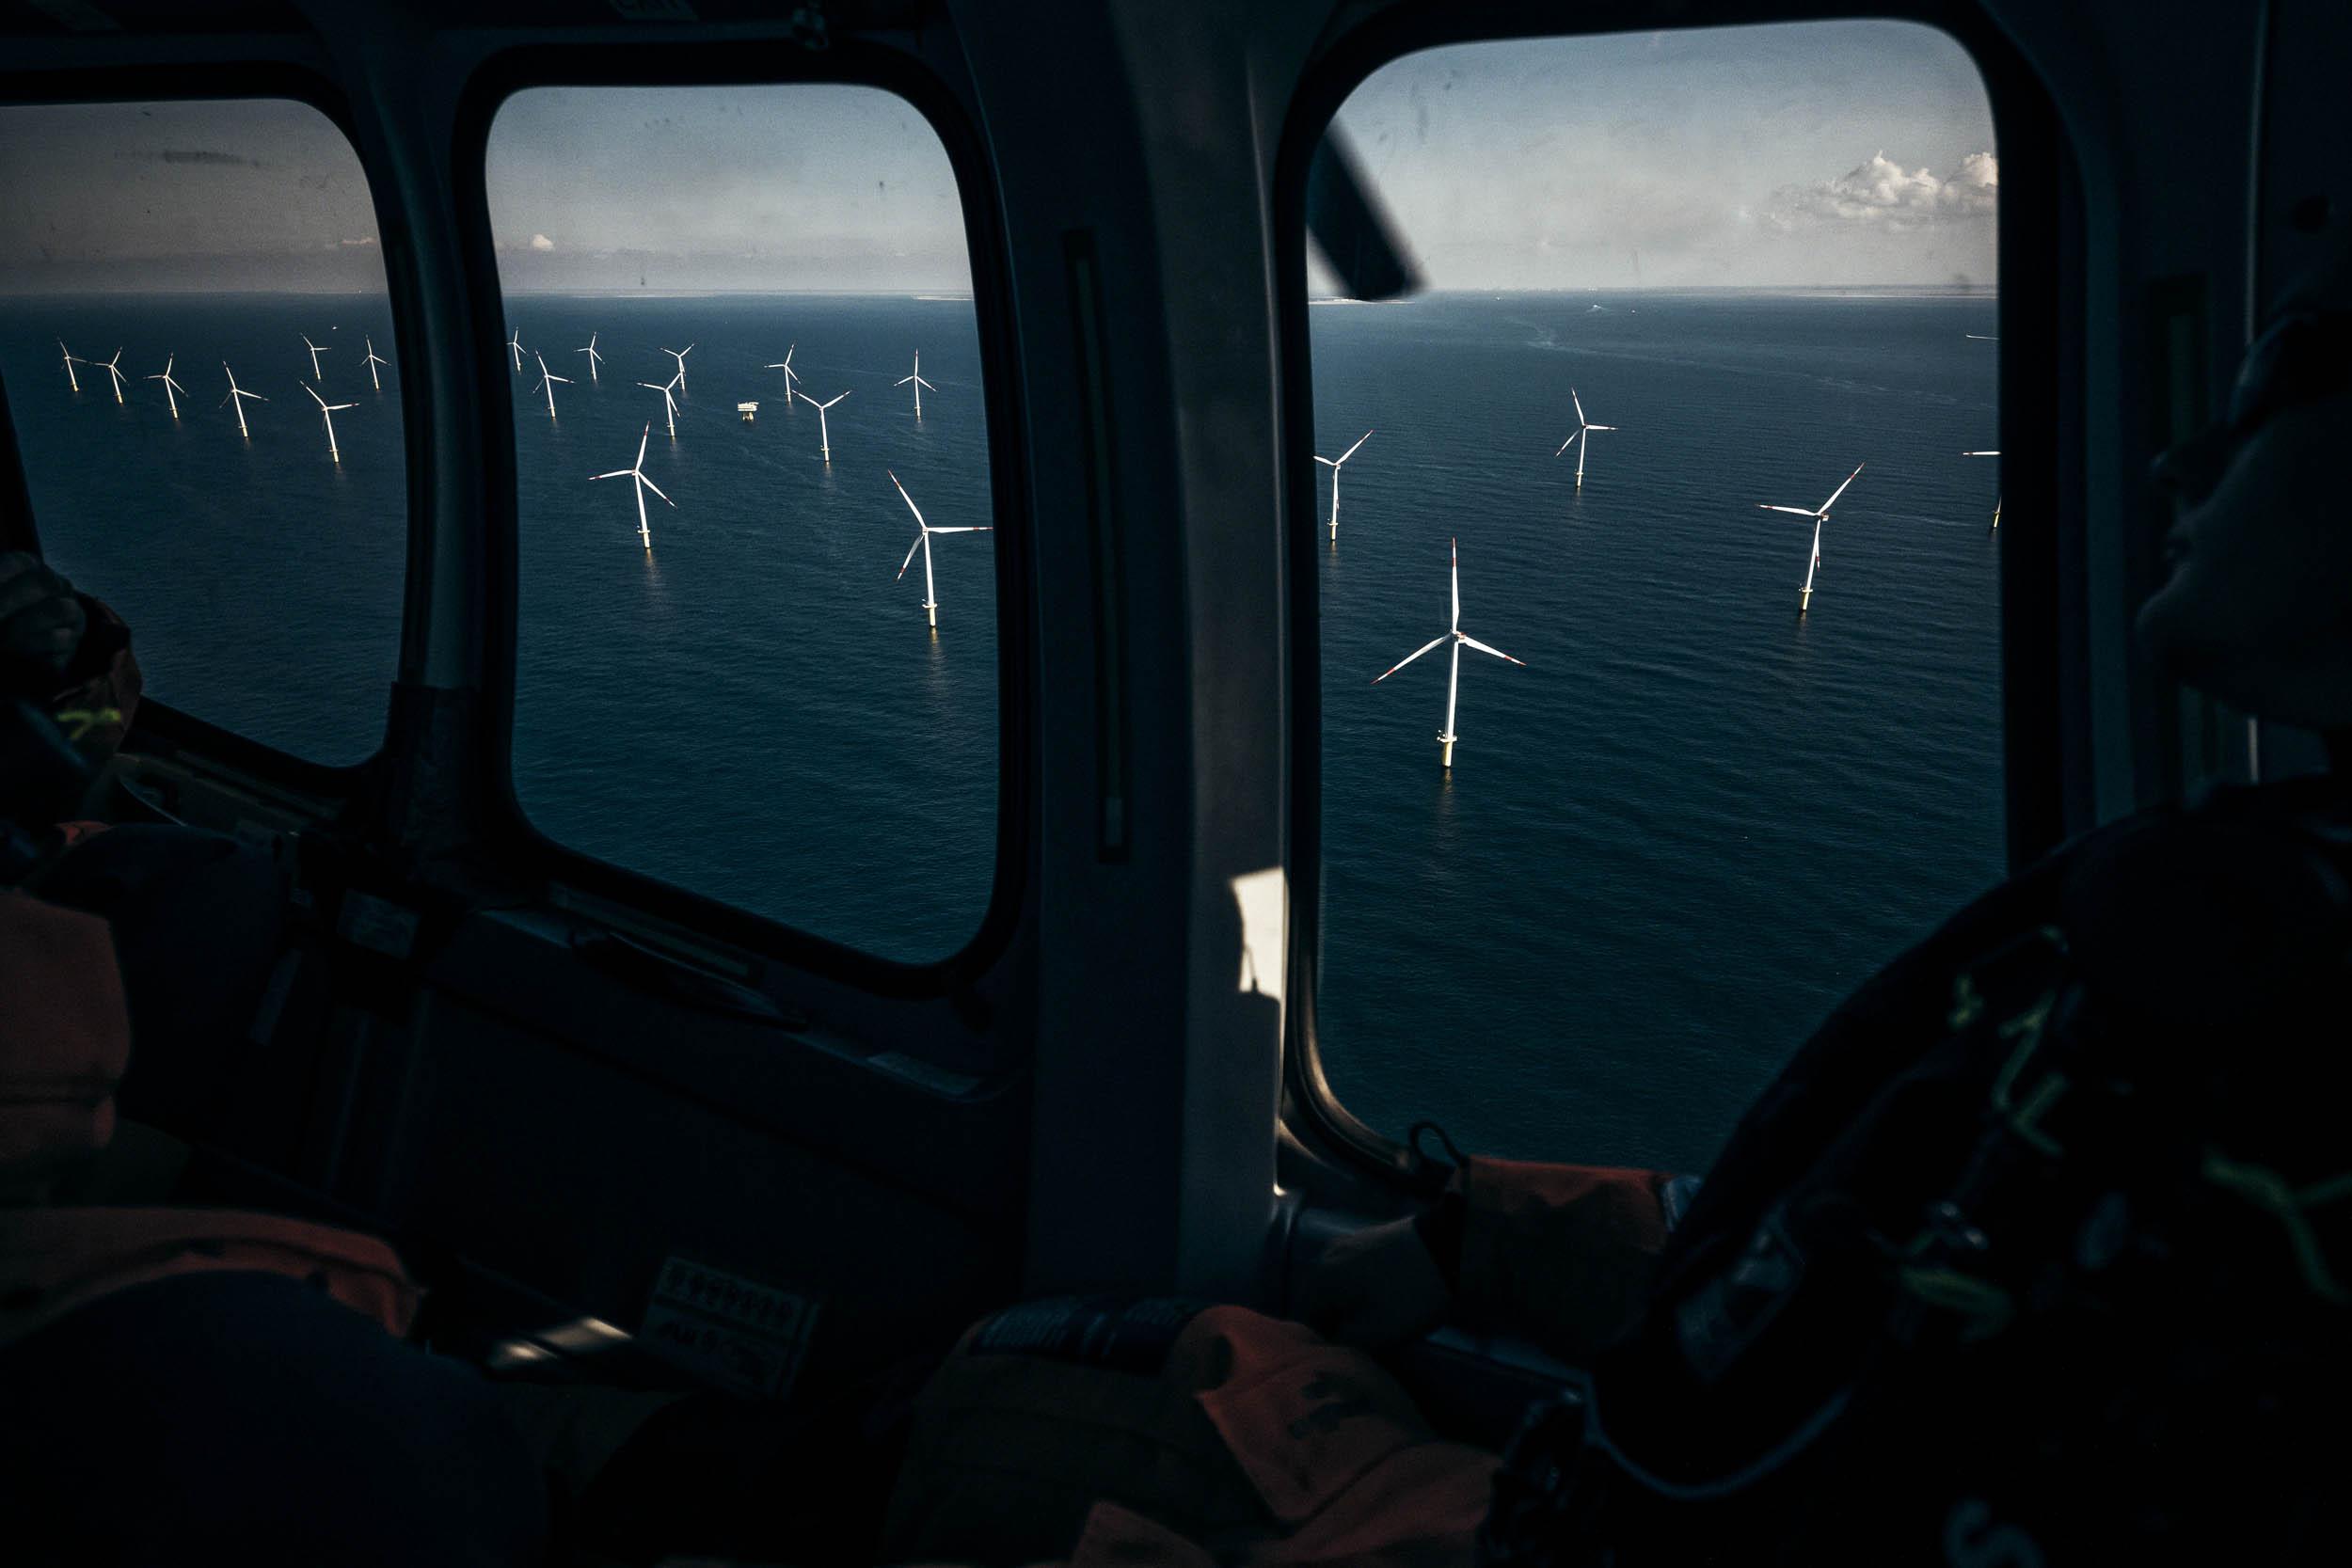 2019-SeifertUebler-EWE-offshore-windpower-011.jpg